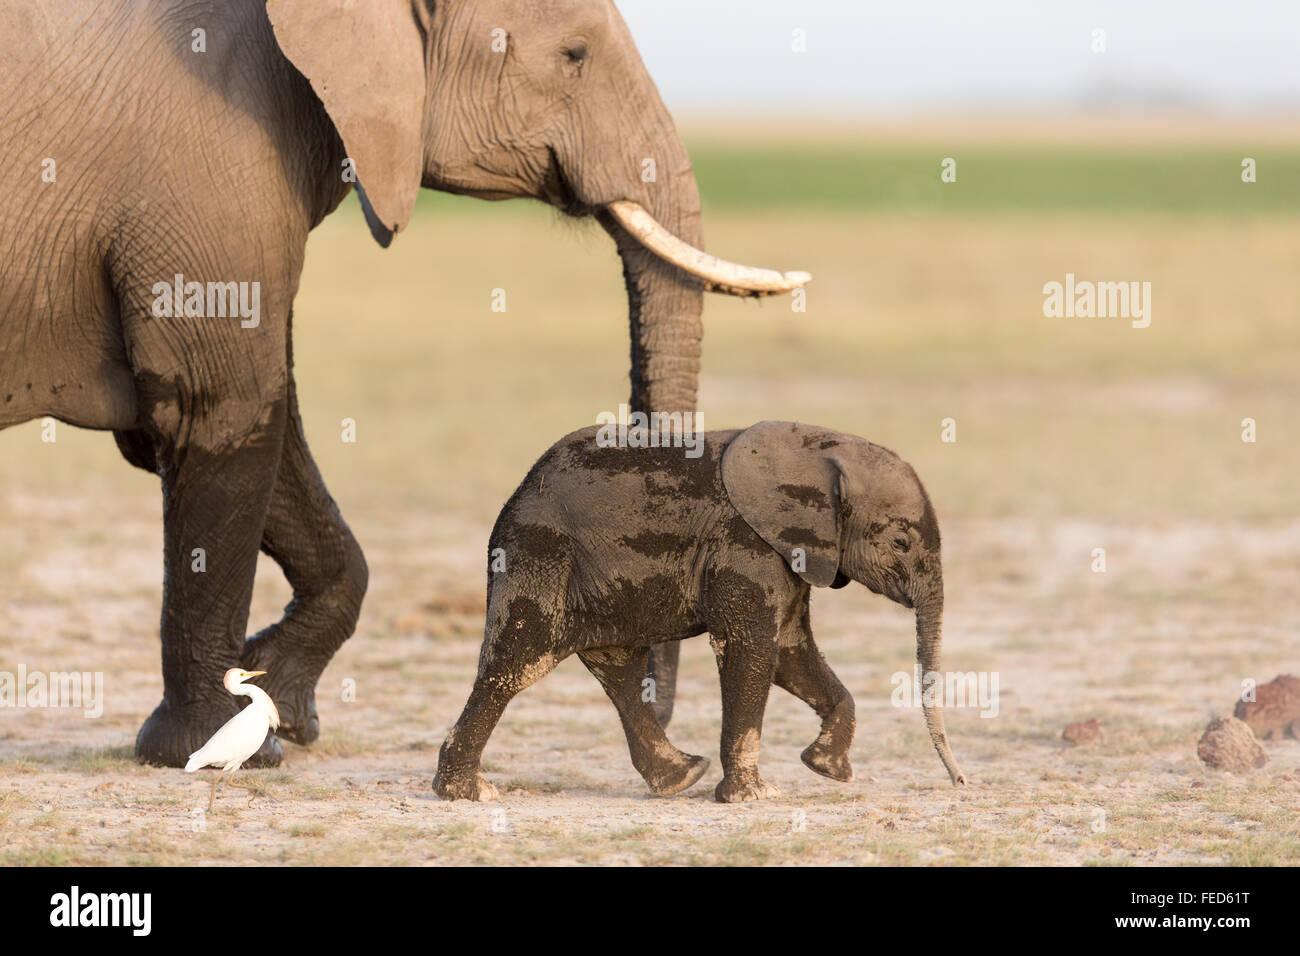 African Elephant Parc national Amboseli au Kenya Banque D'Images